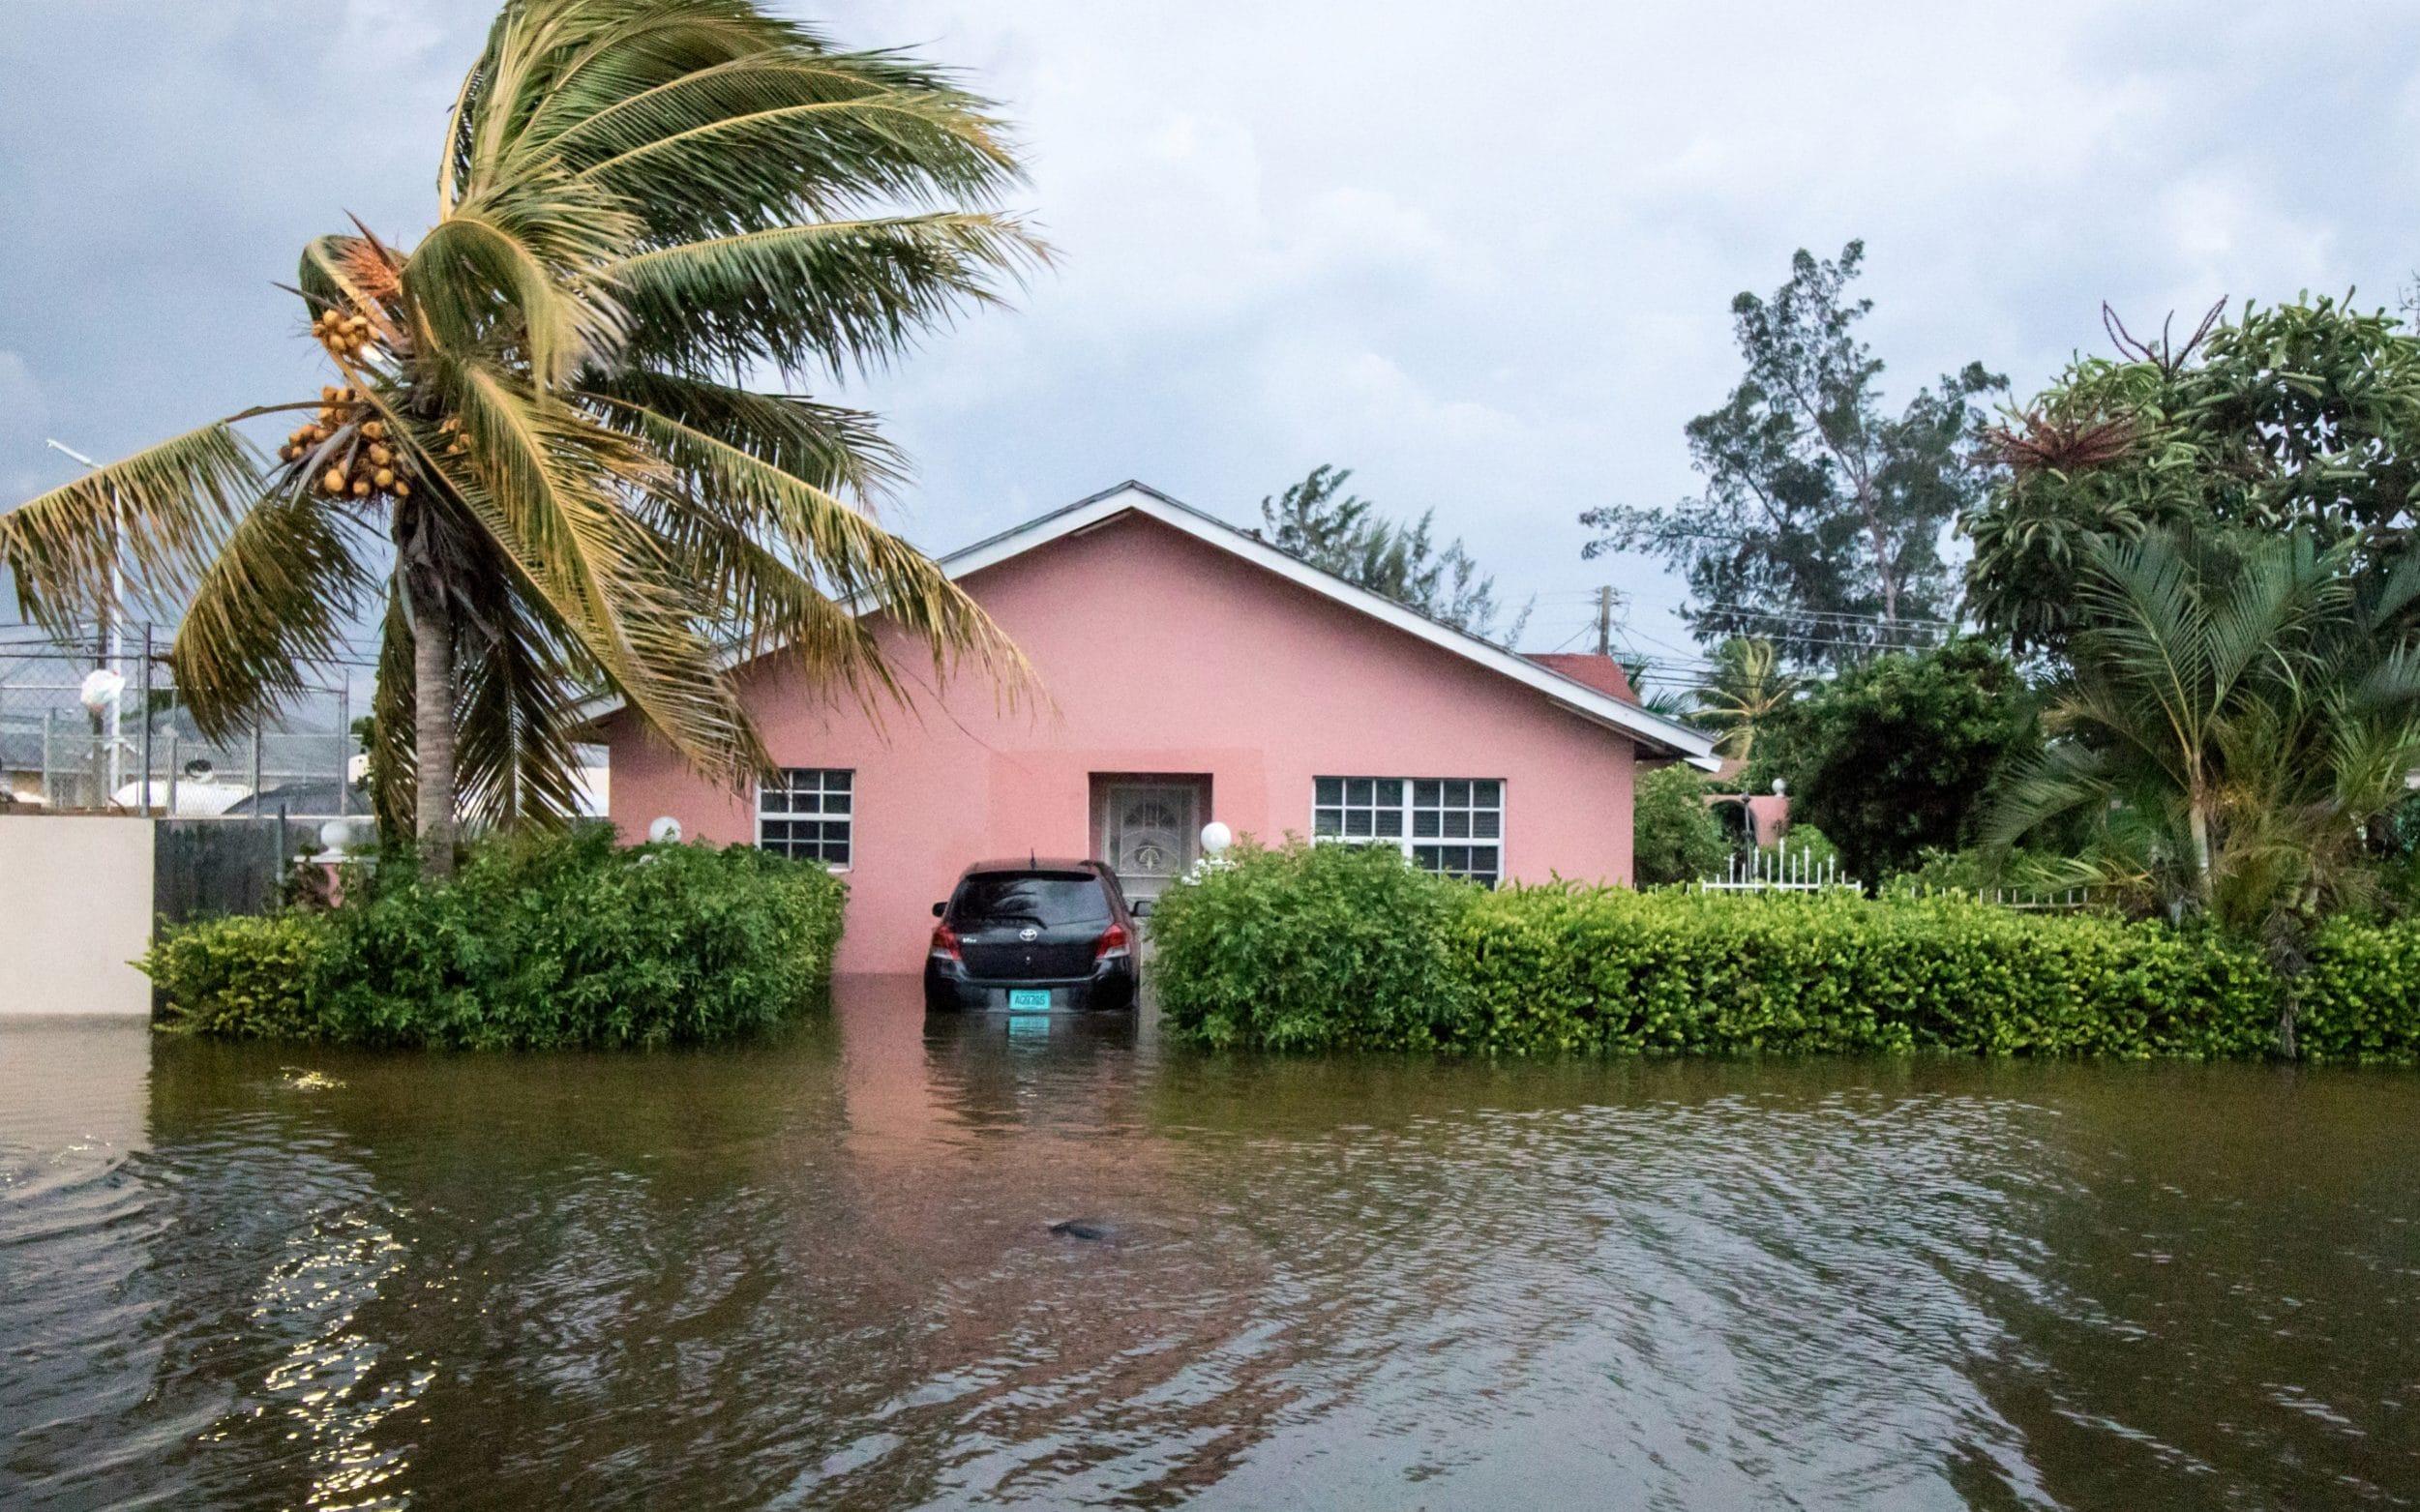 Hurricane Dorian: Catastrophic damage in Bahamas leaves 60,000 needing drinking water